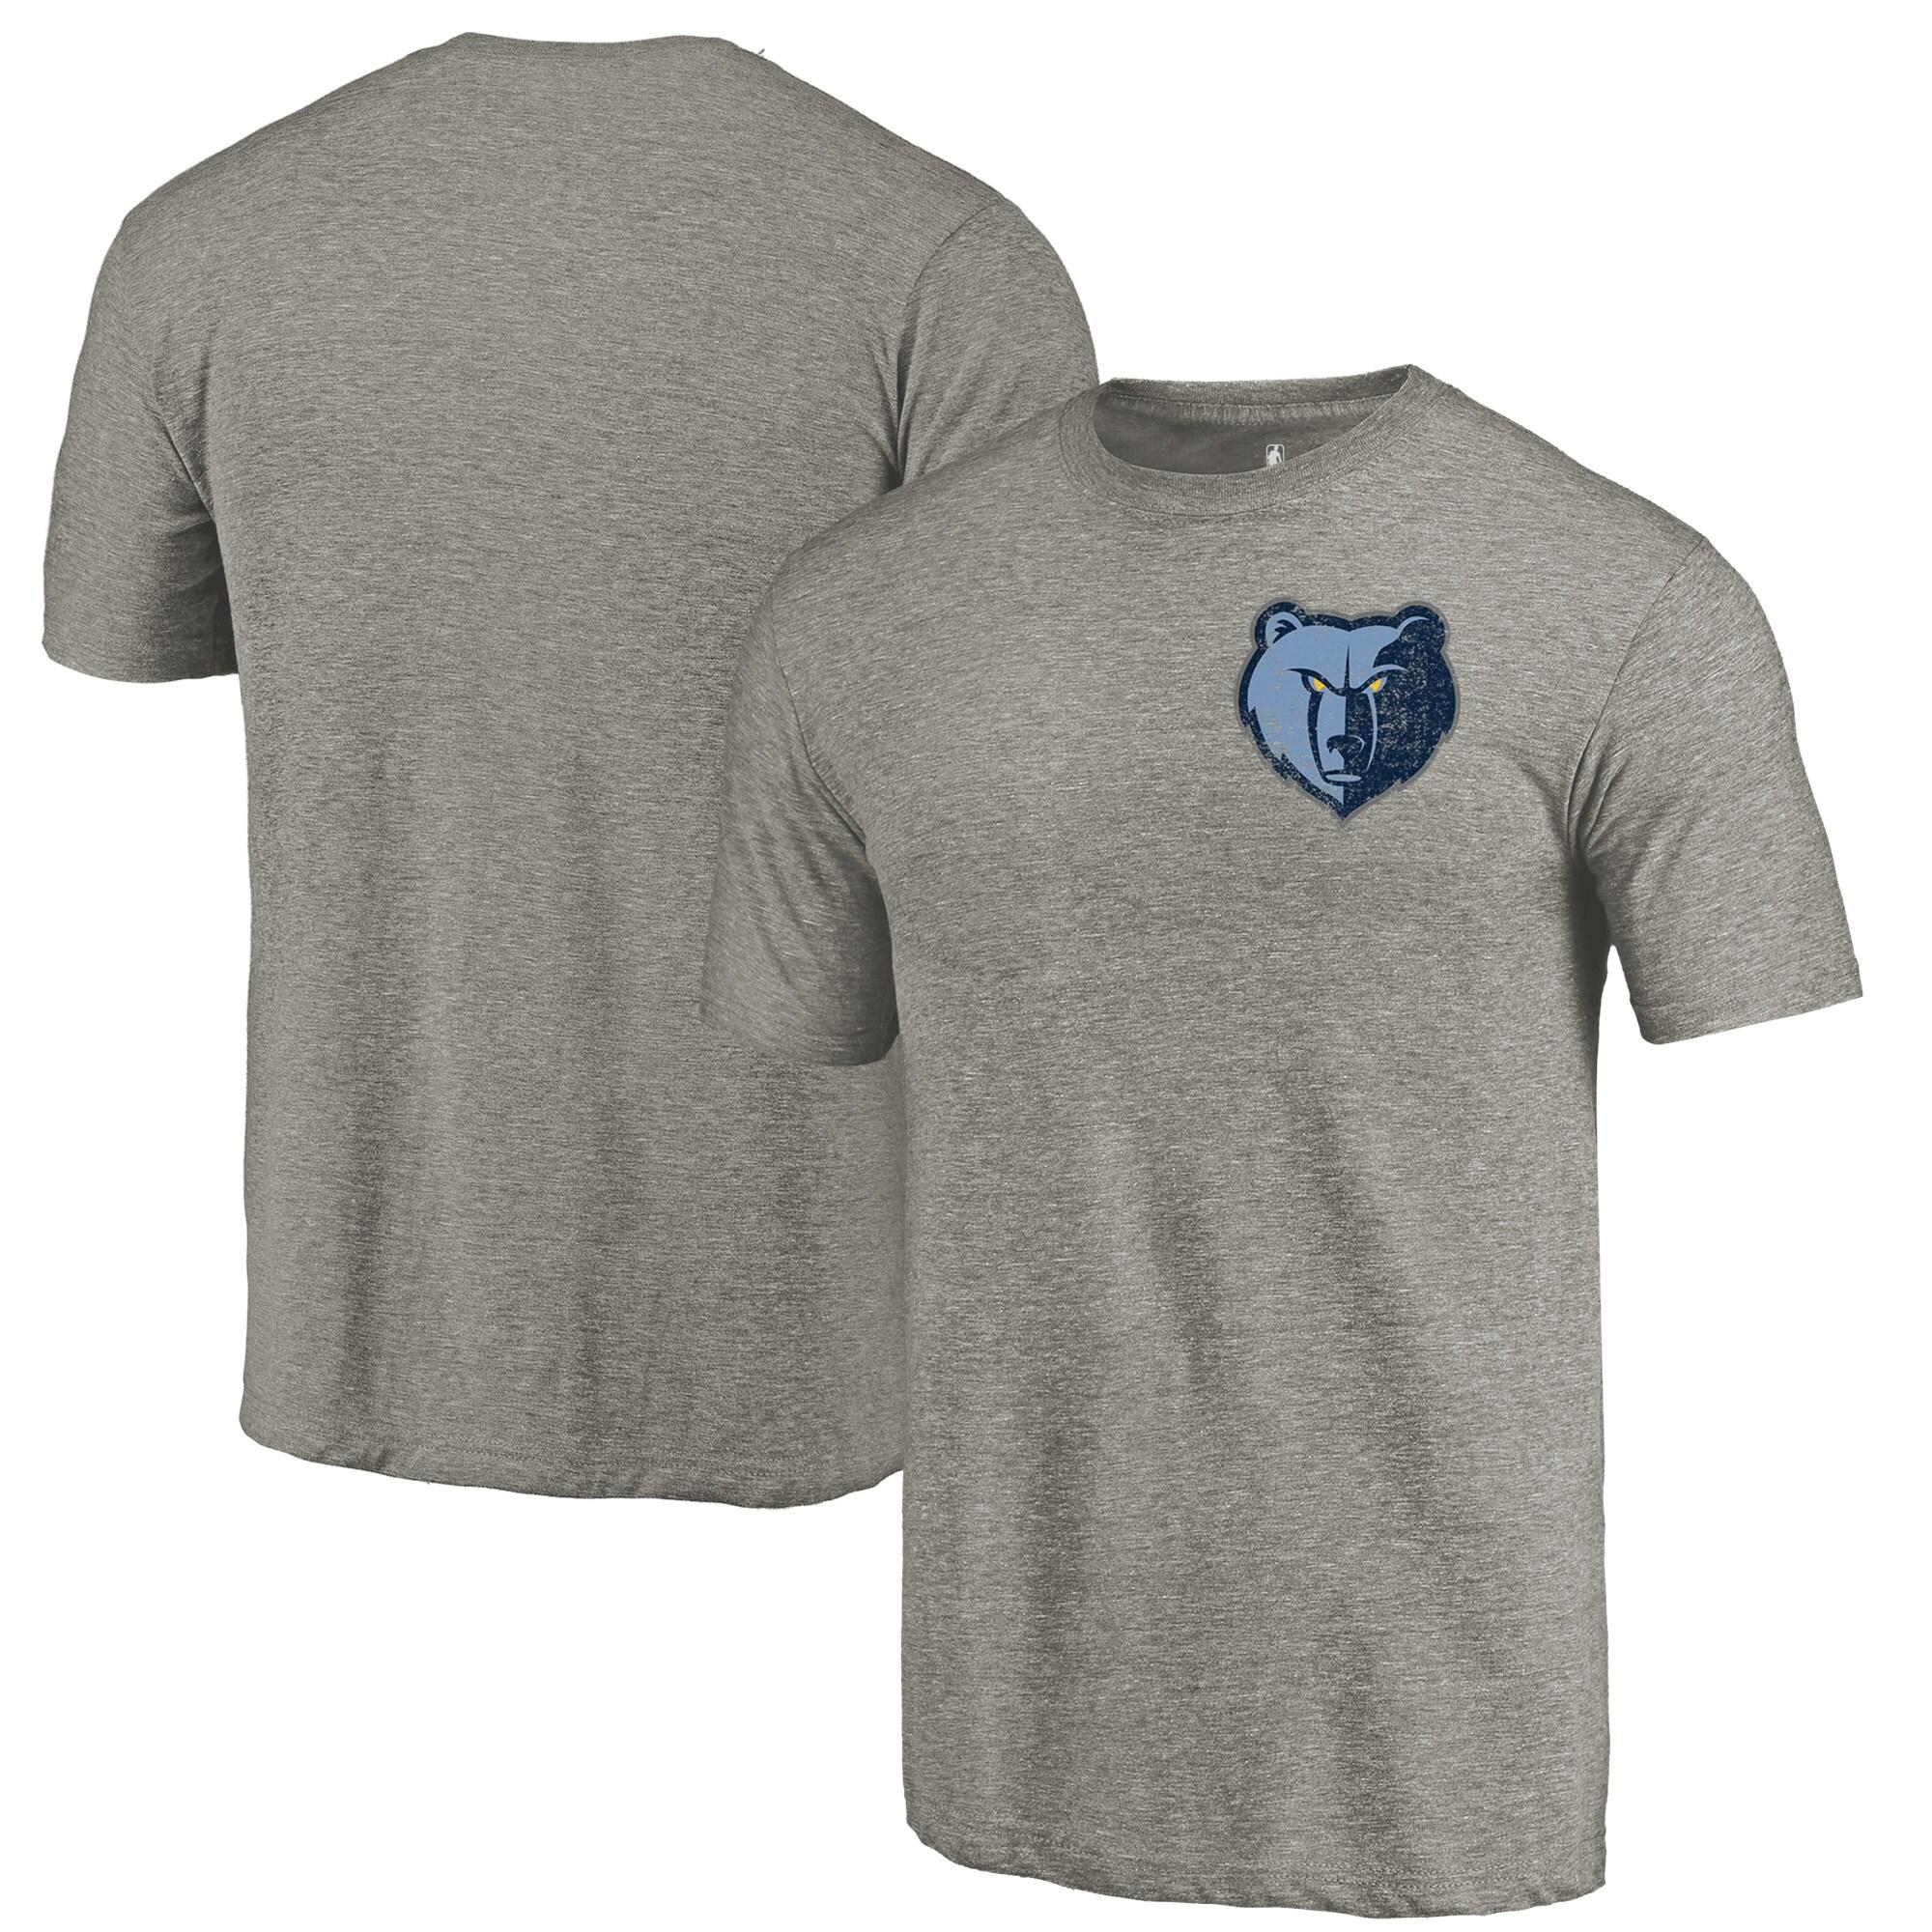 Memphis Grizzlies Fanatics Branded Primary Logo Left Chest Distressed Tri-Blend T-Shirt - Gray